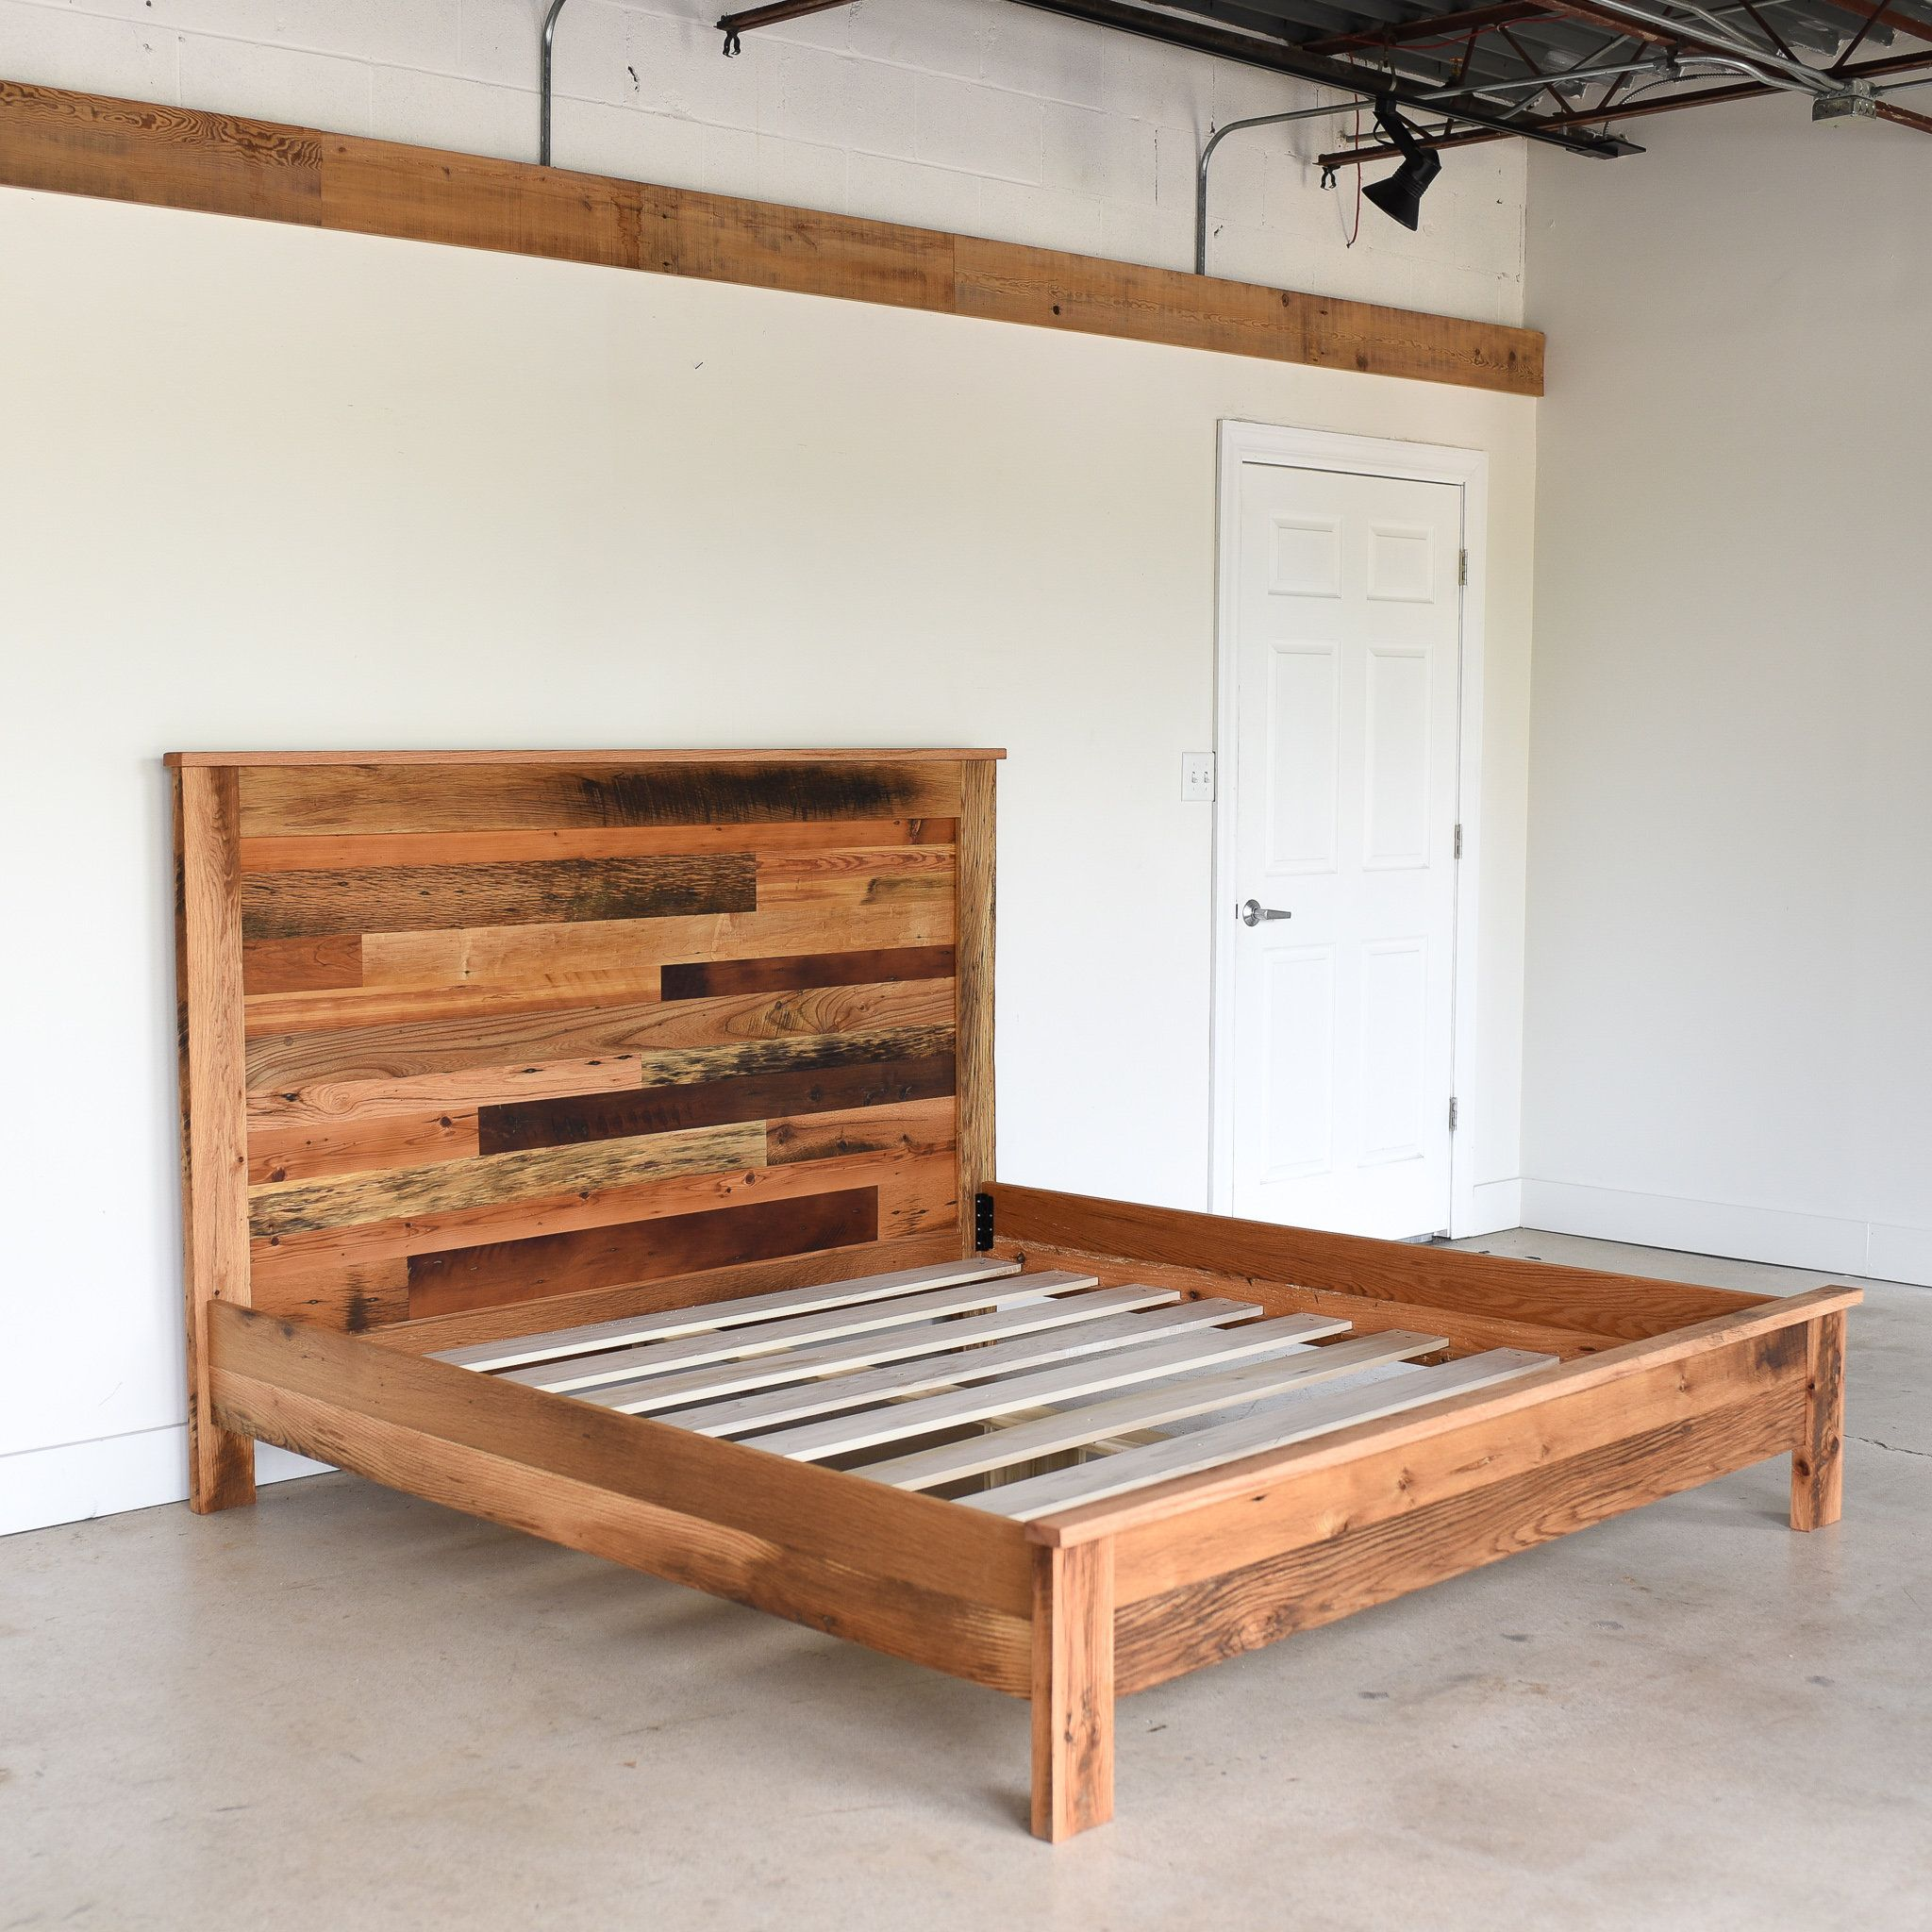 reclaimed wood bed frame